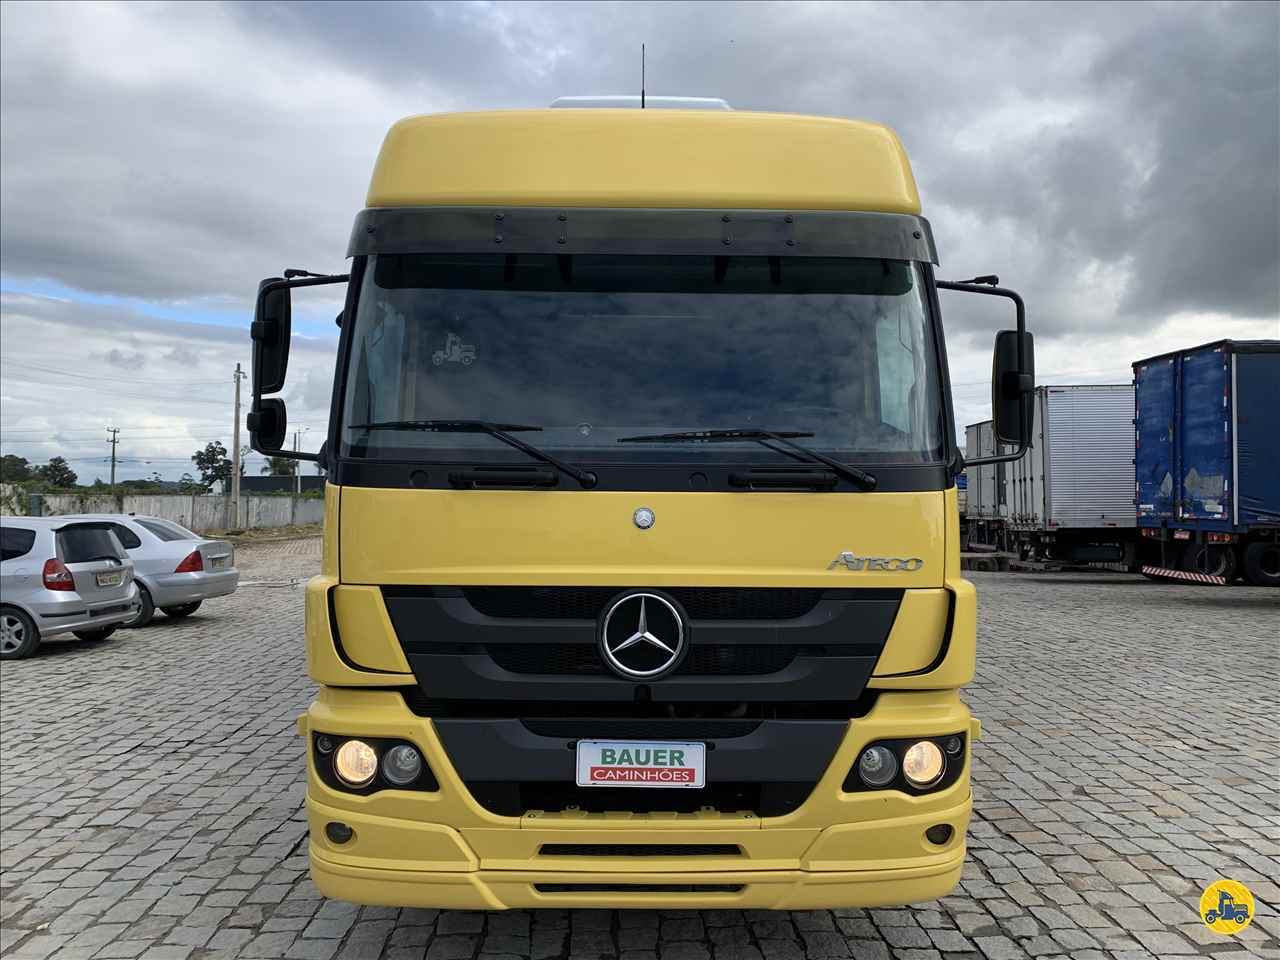 CAMINHAO MERCEDES-BENZ MB 2430 Baú Térmico Truck 6x2 Bauer Caminhões ITAJAI SANTA CATARINA SC